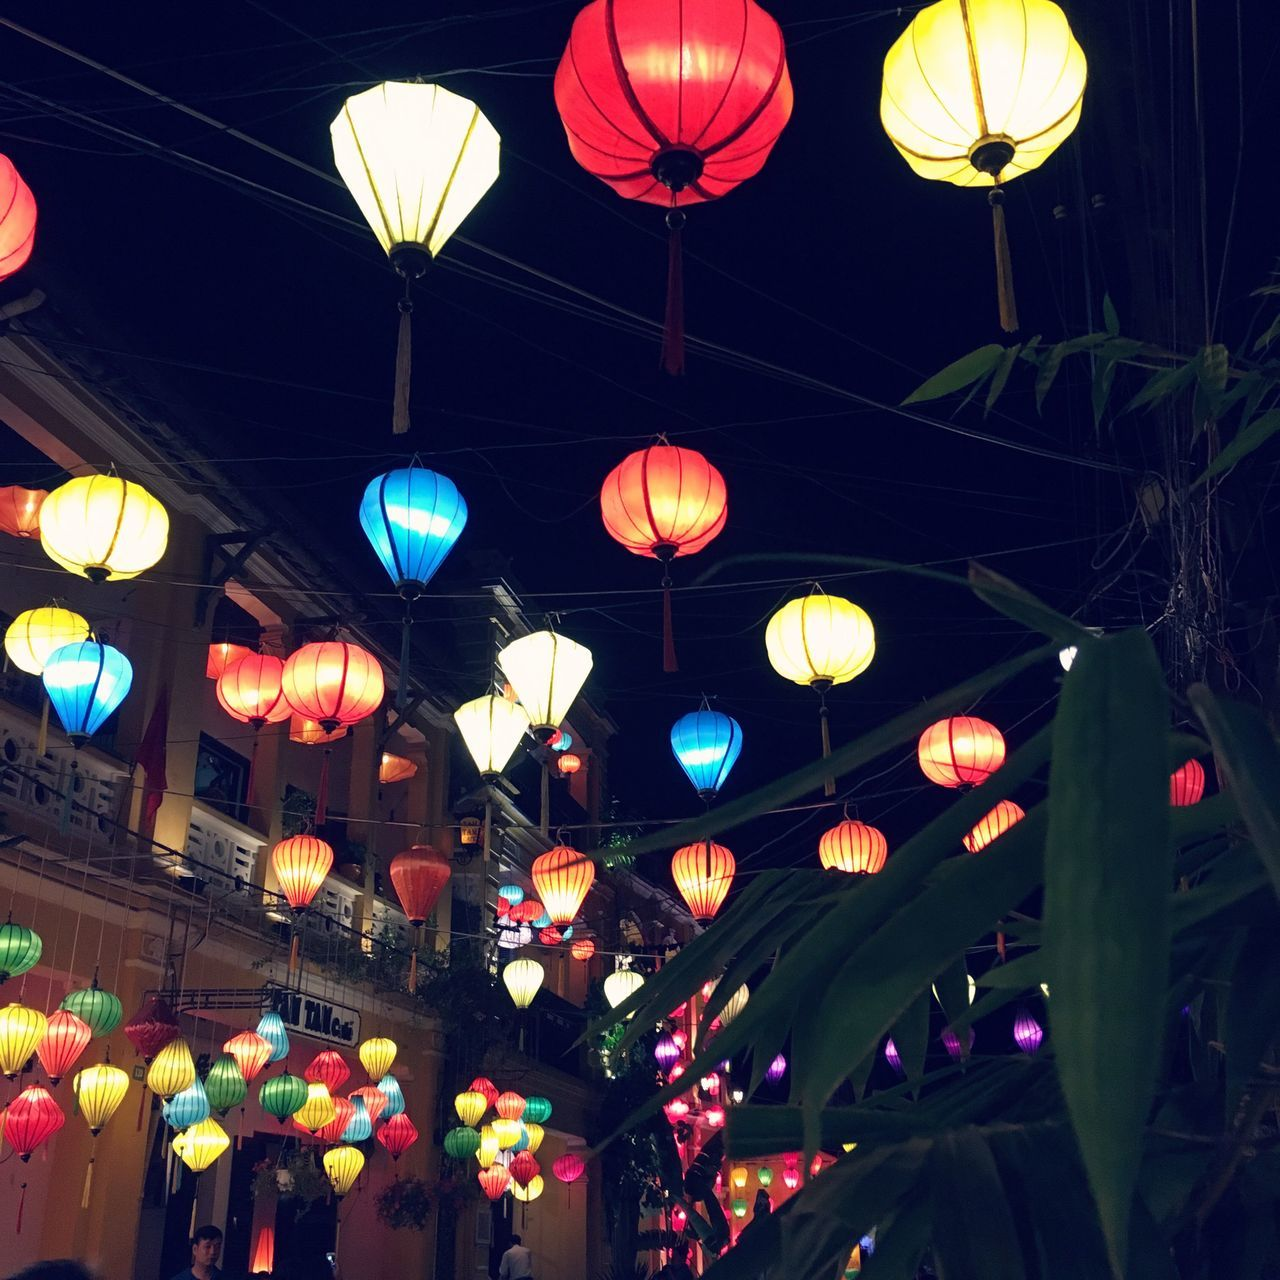 Hanging Illuminated Lighting Equipment Lantern Night Voyage Travel Vietnam Travel Destinations Hoi An